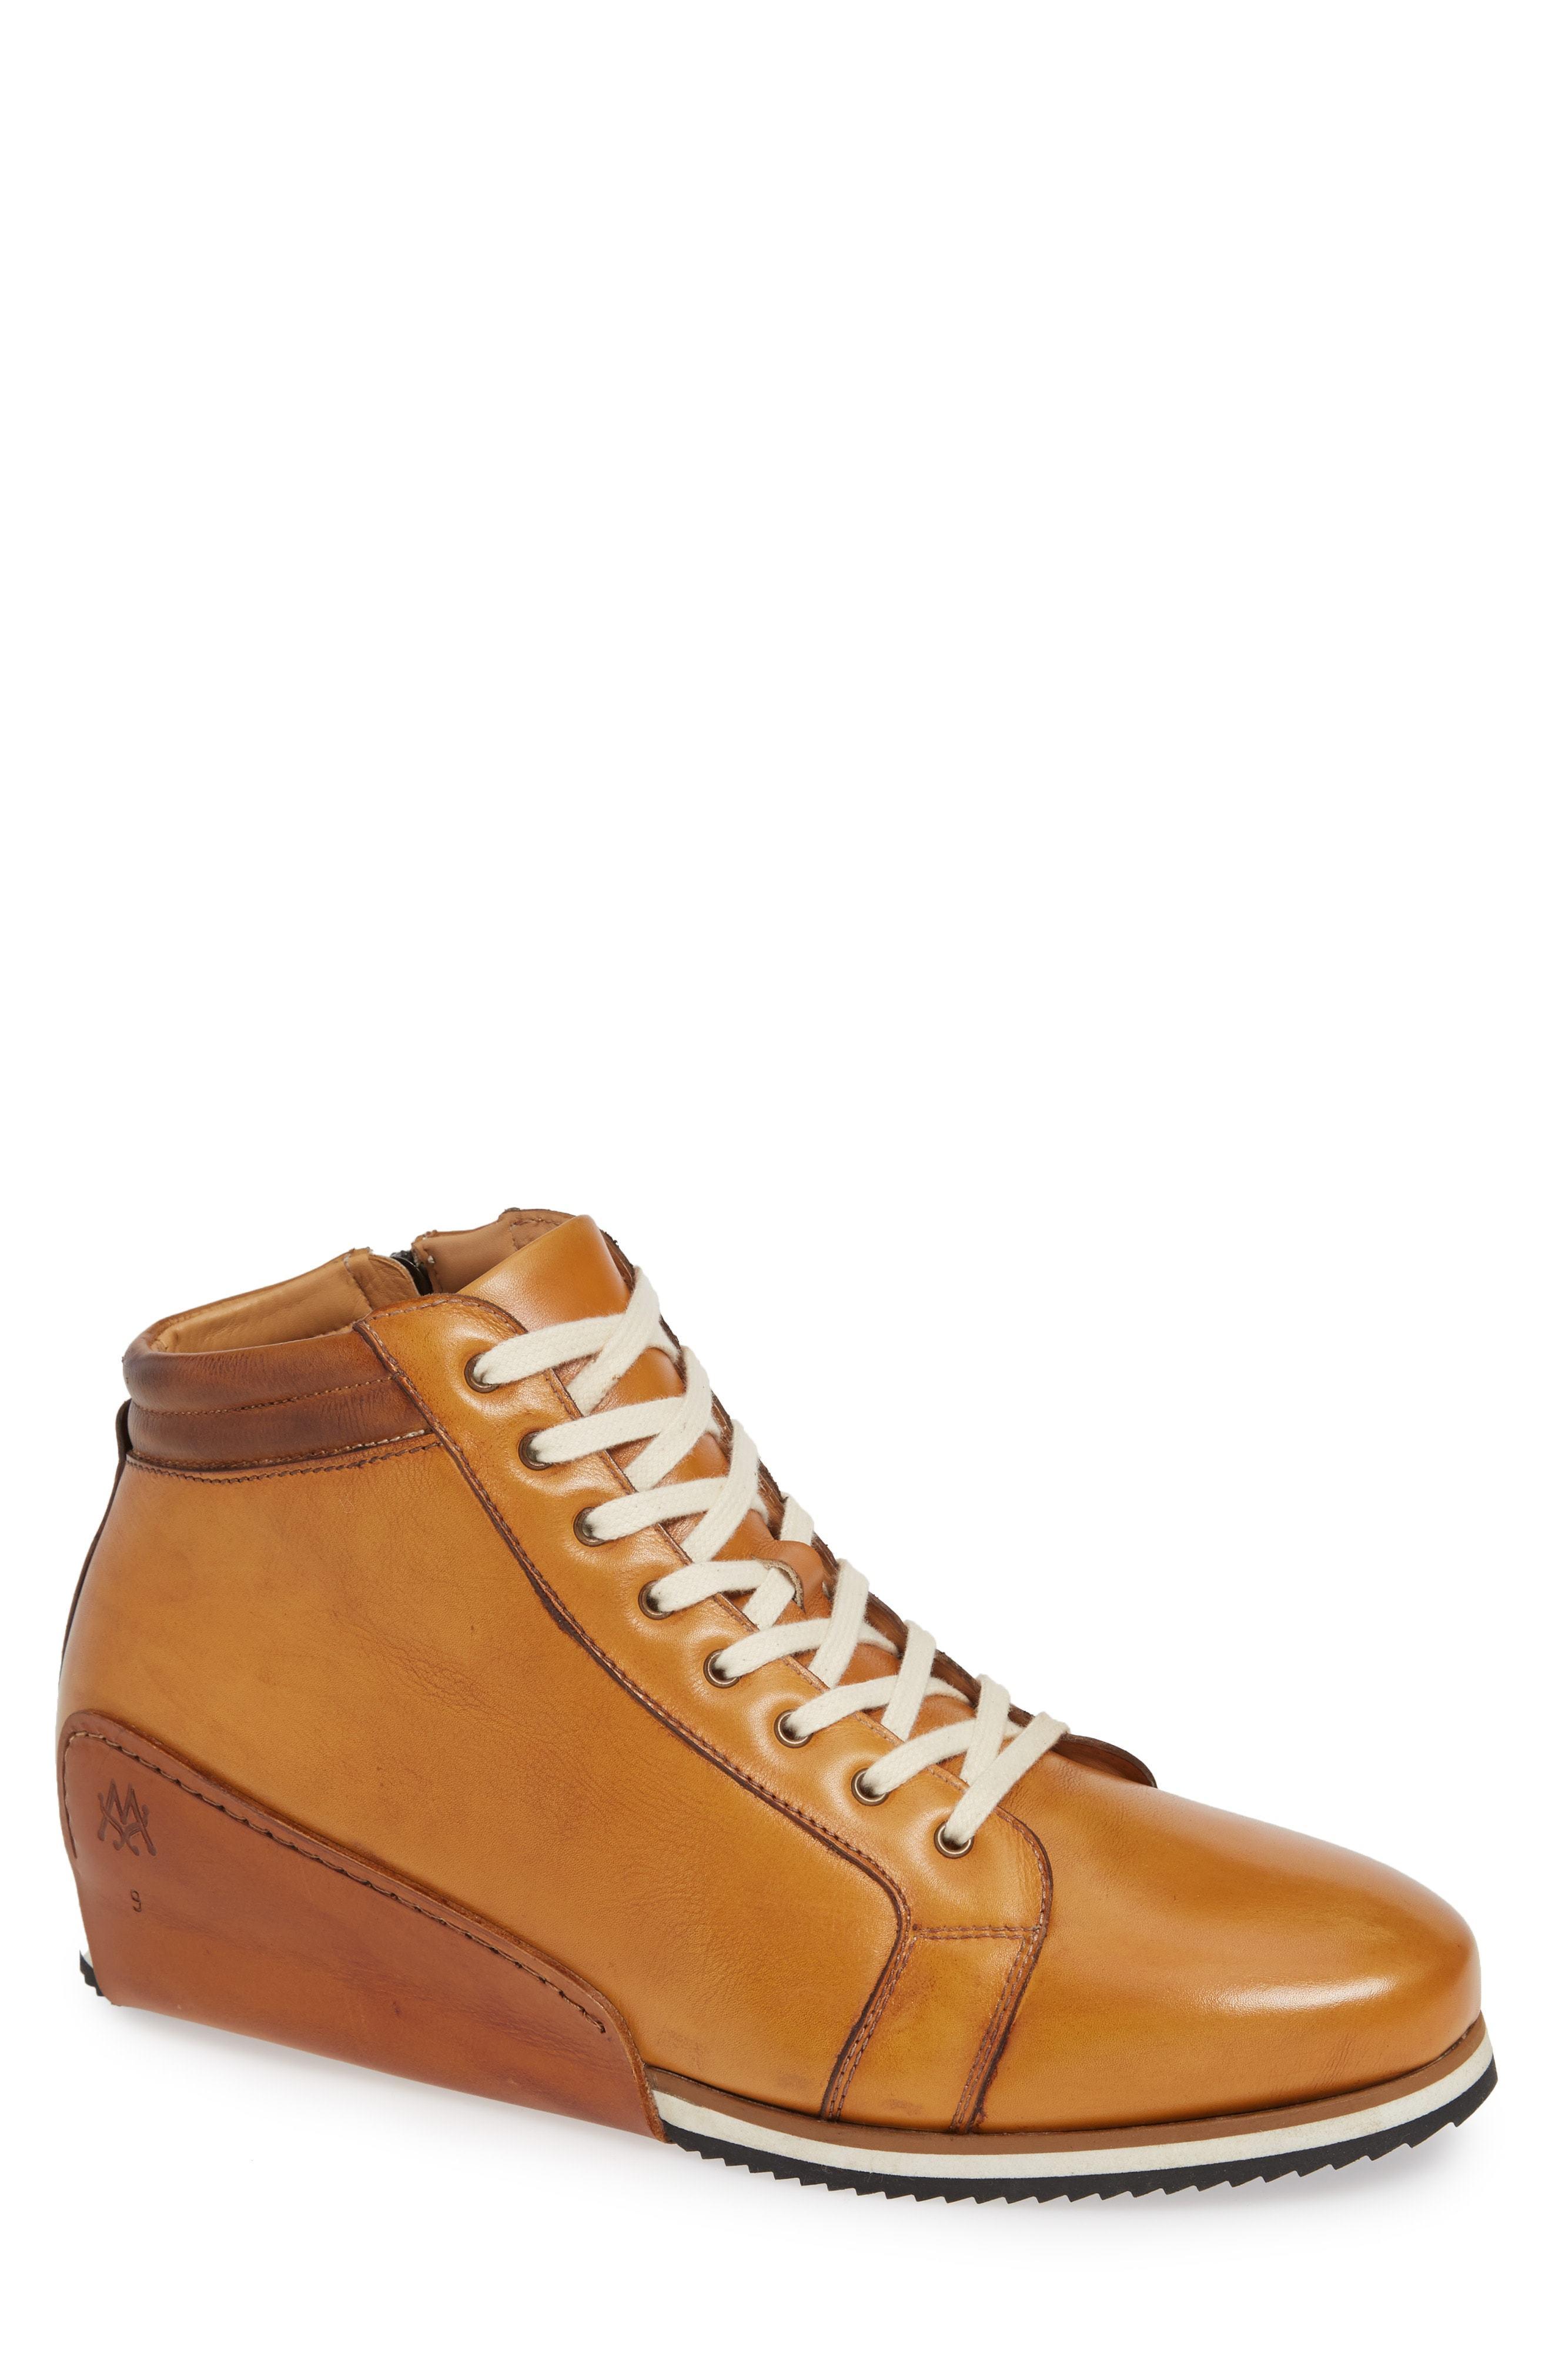 Mezlan Niro Sneaker, $395 | Nordstrom